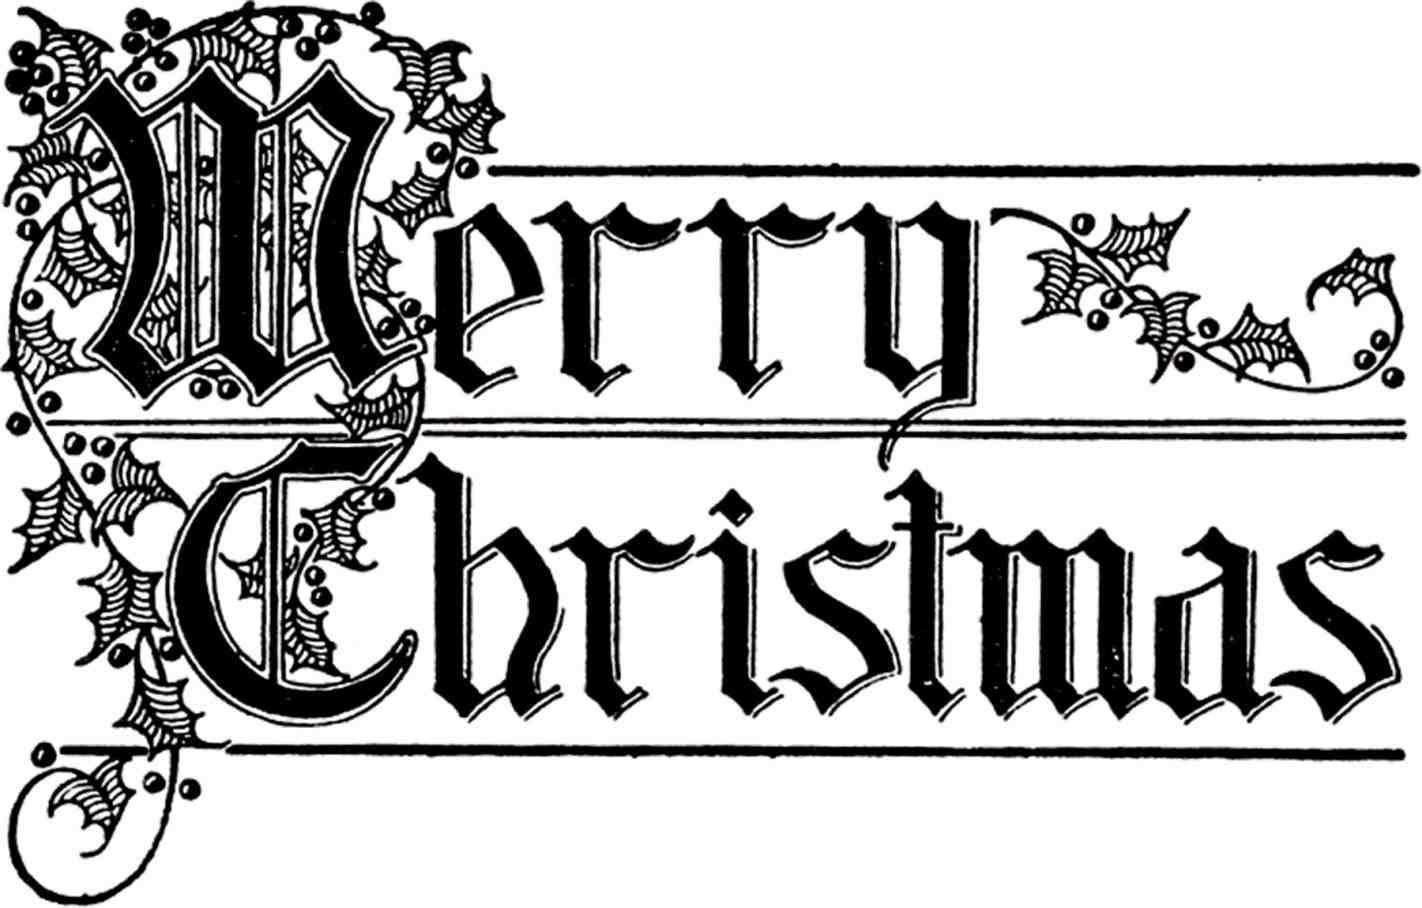 merry christmas logo black and white.